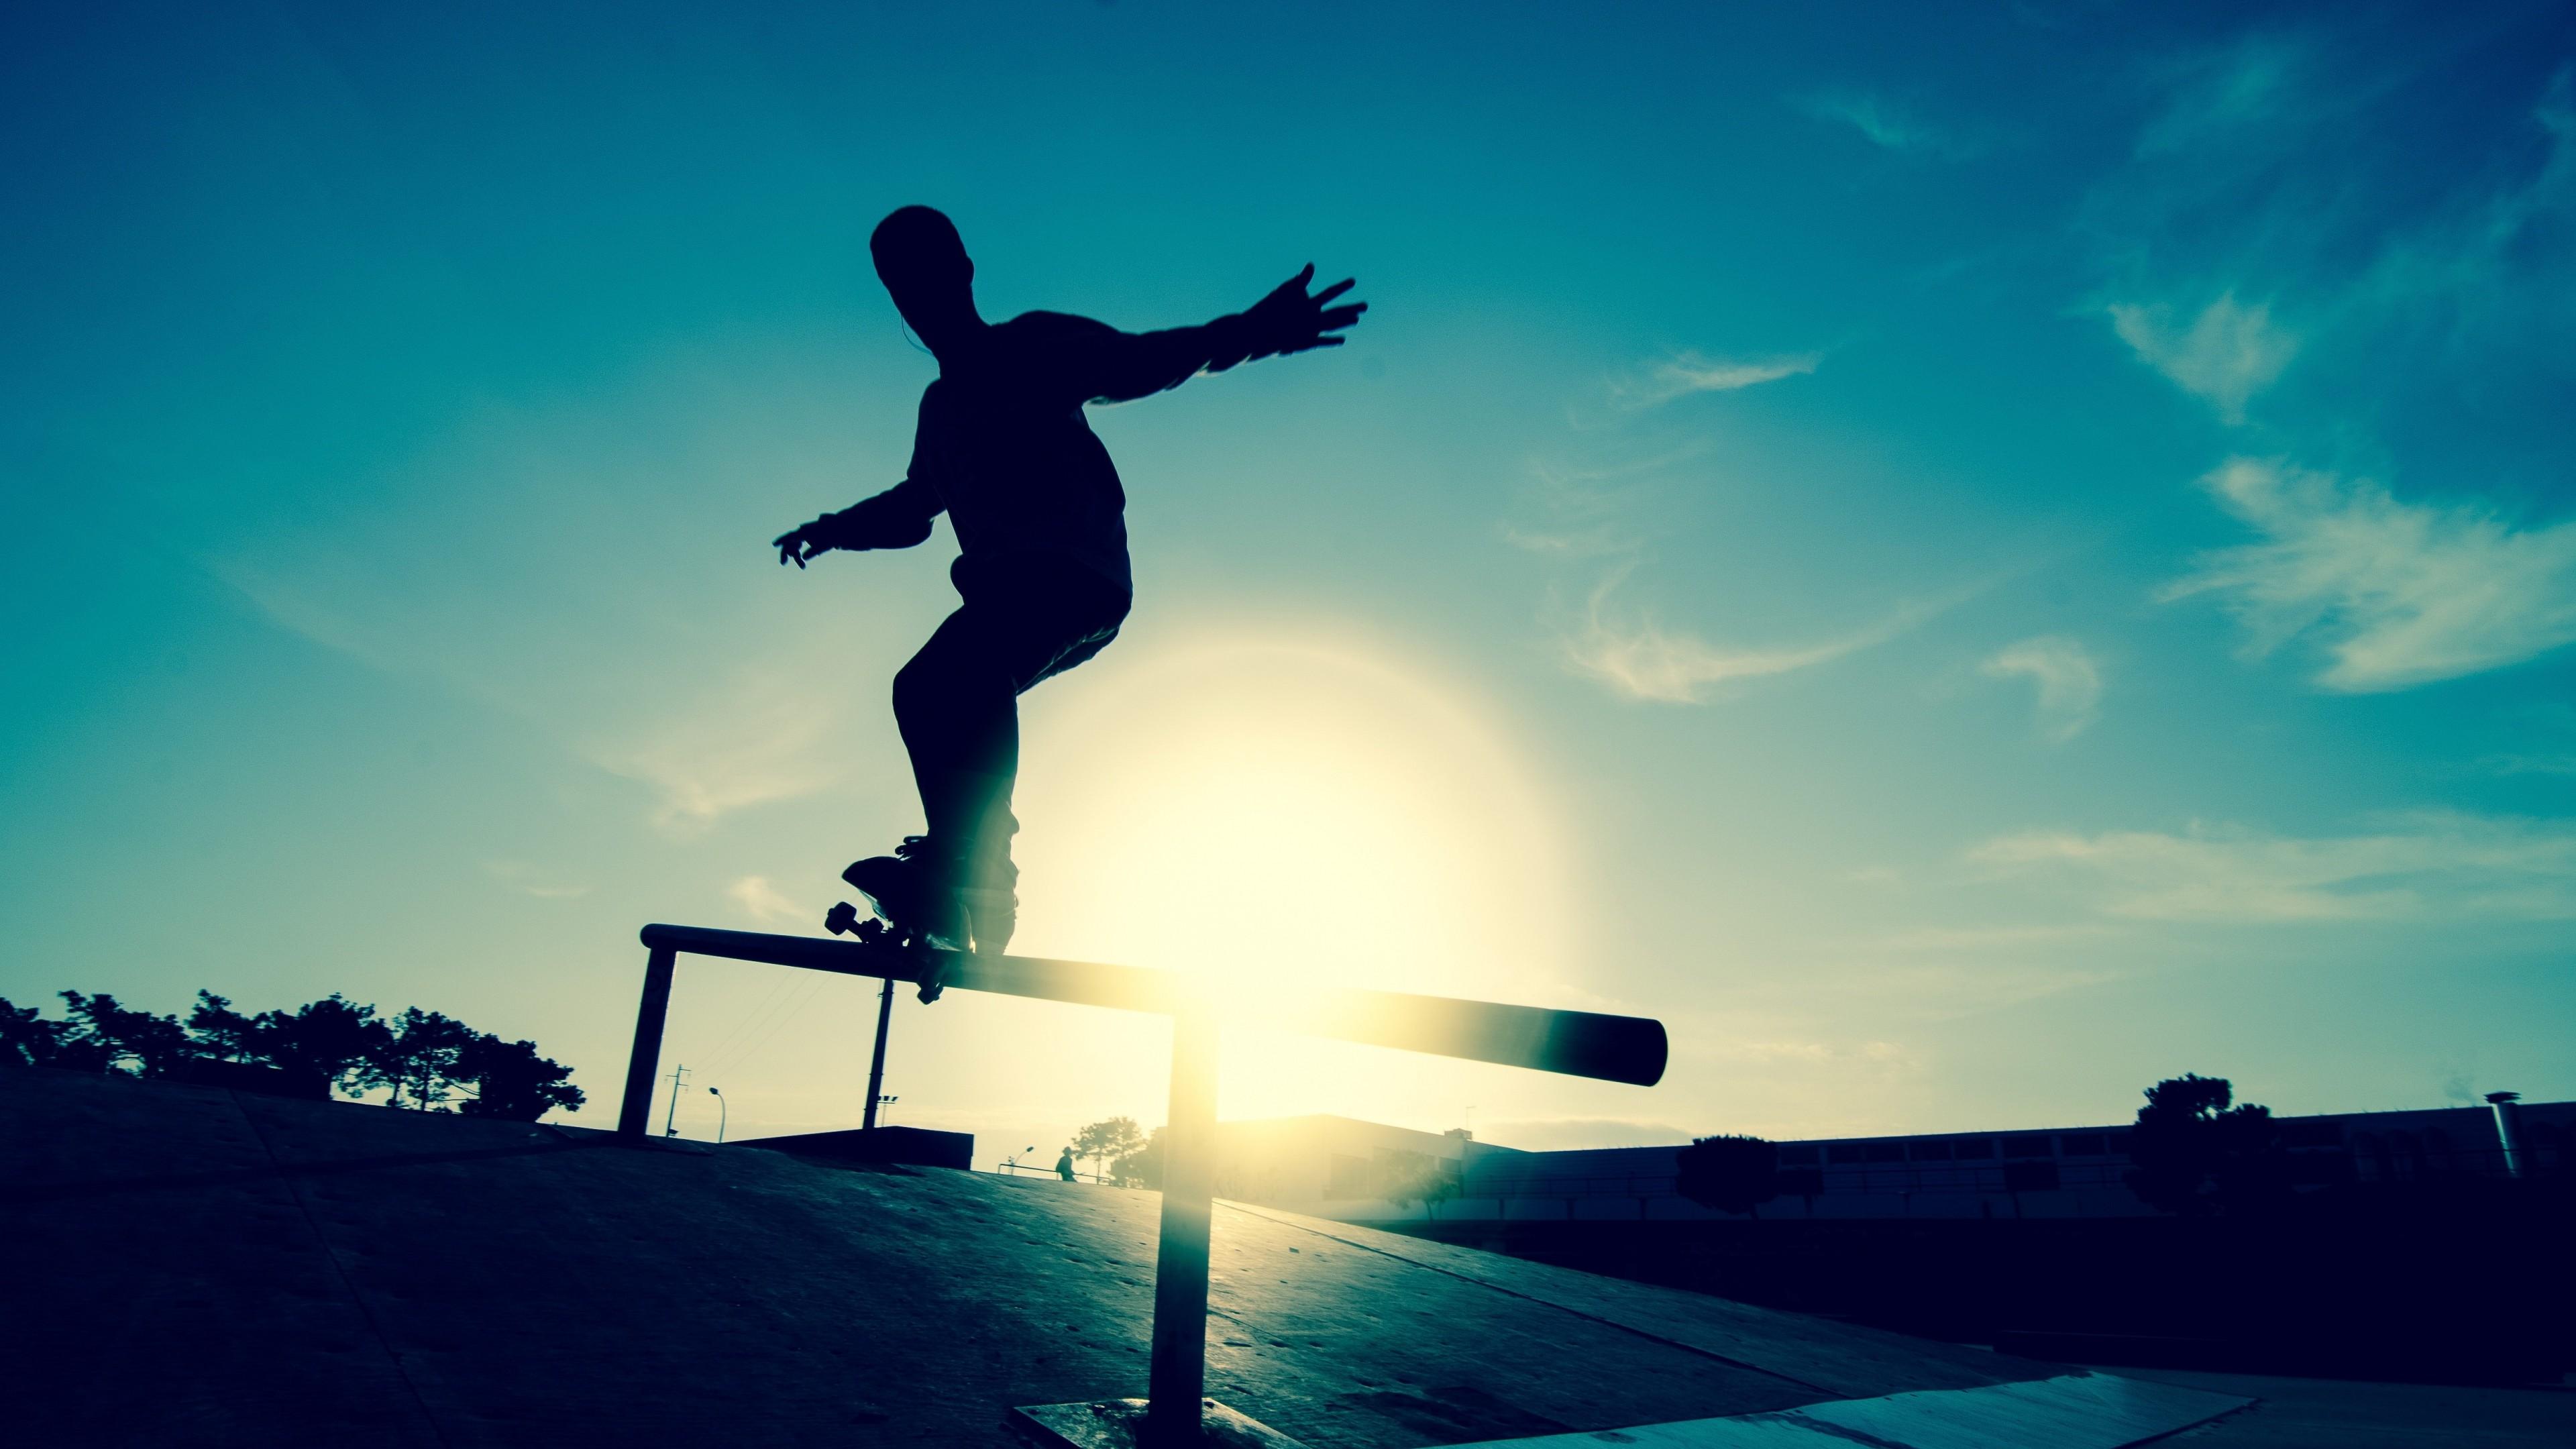 Wallpaper skate, board, athlete, railings, motion, silhouette, ice  rink